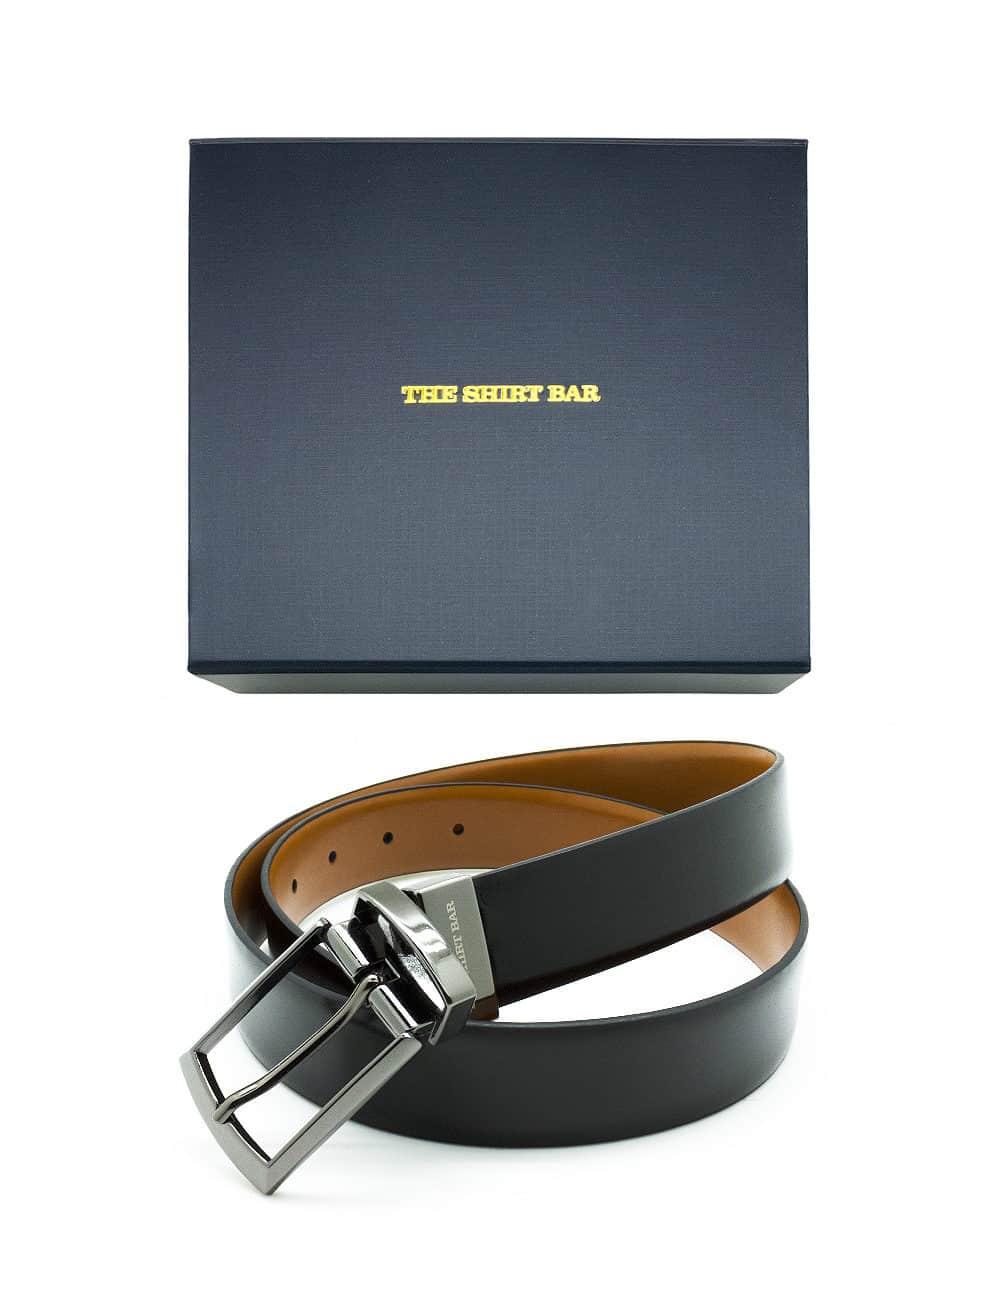 Black / Tan Reversible Leather Belt LBR9.8